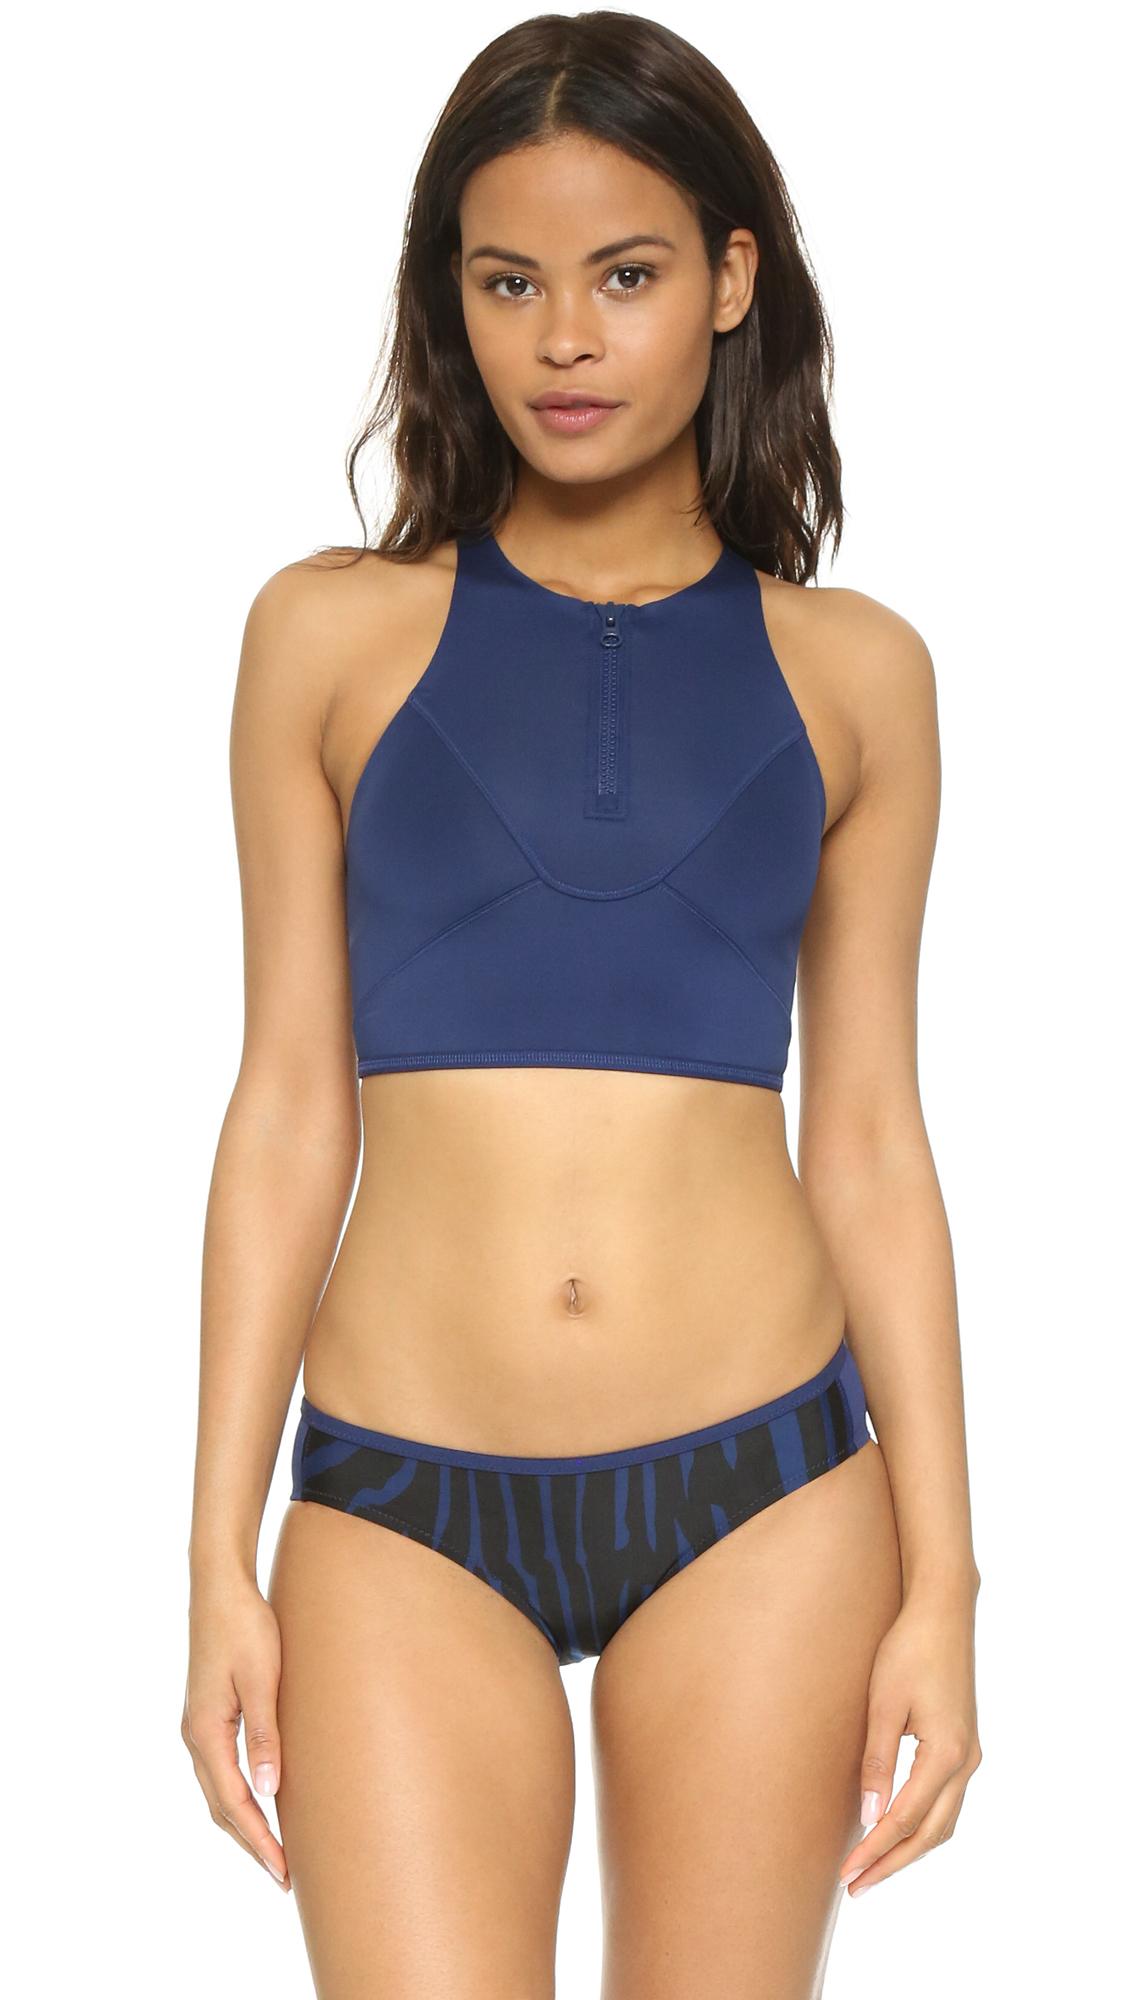 e43d91dd6e Lyst - adidas By Stella McCartney Zip Bikini Top in Blue